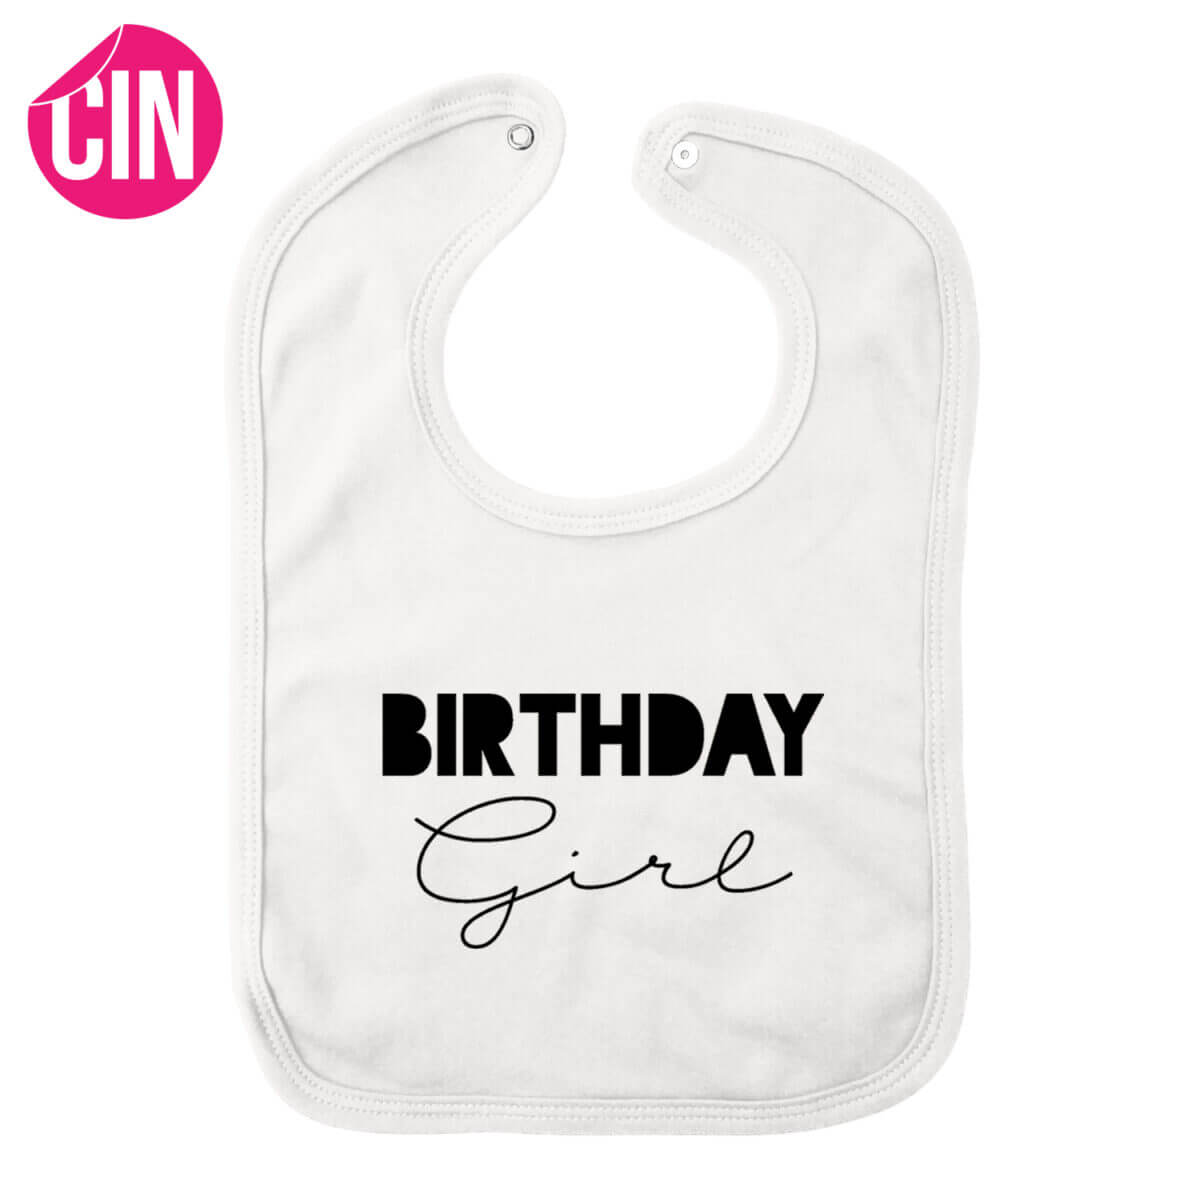 birthday girl slabber wit cindysigns